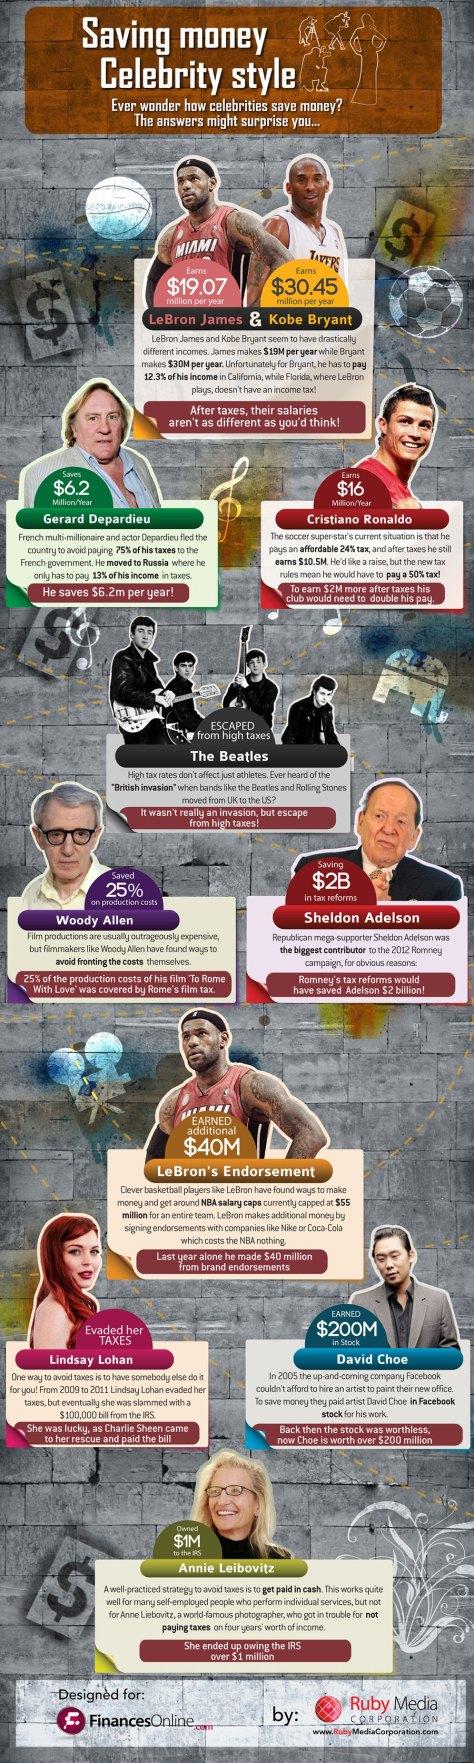 Net Worth of Celebrities: Smart <a href=